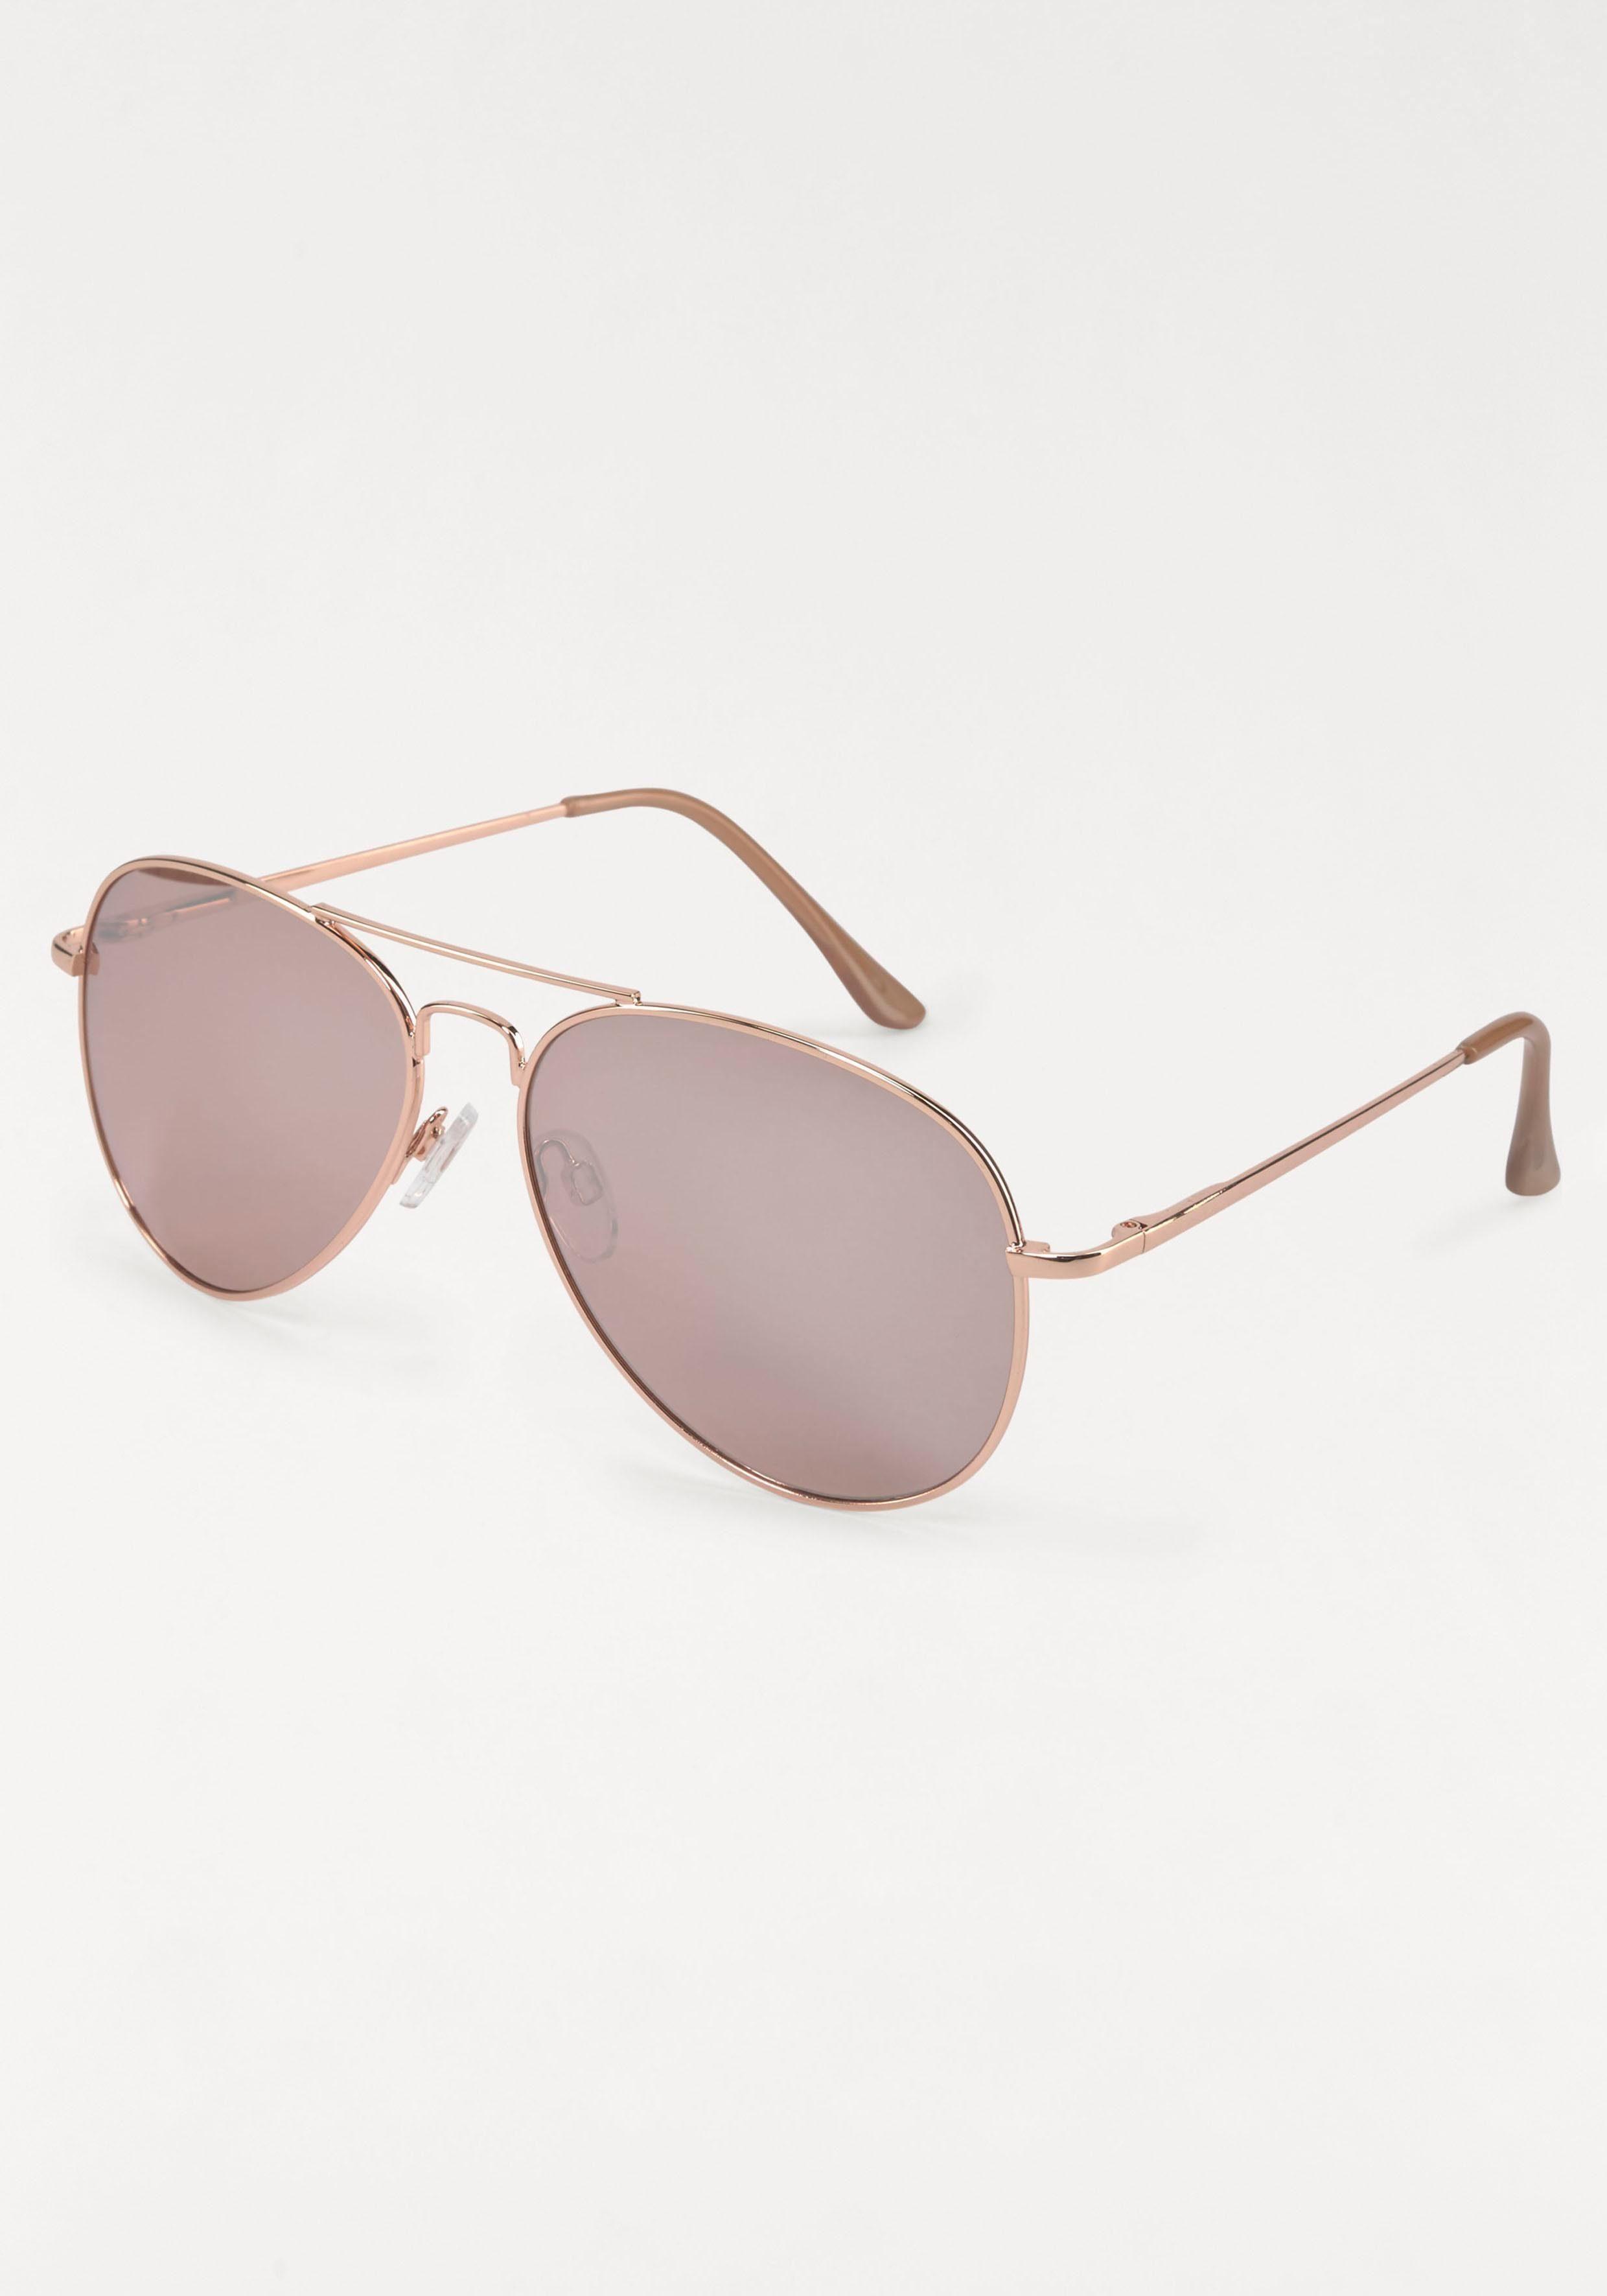 Sonnenbrille | Accessoires > Sonnenbrillen > Sonstige Sonnenbrillen | Rosa | QUELLE